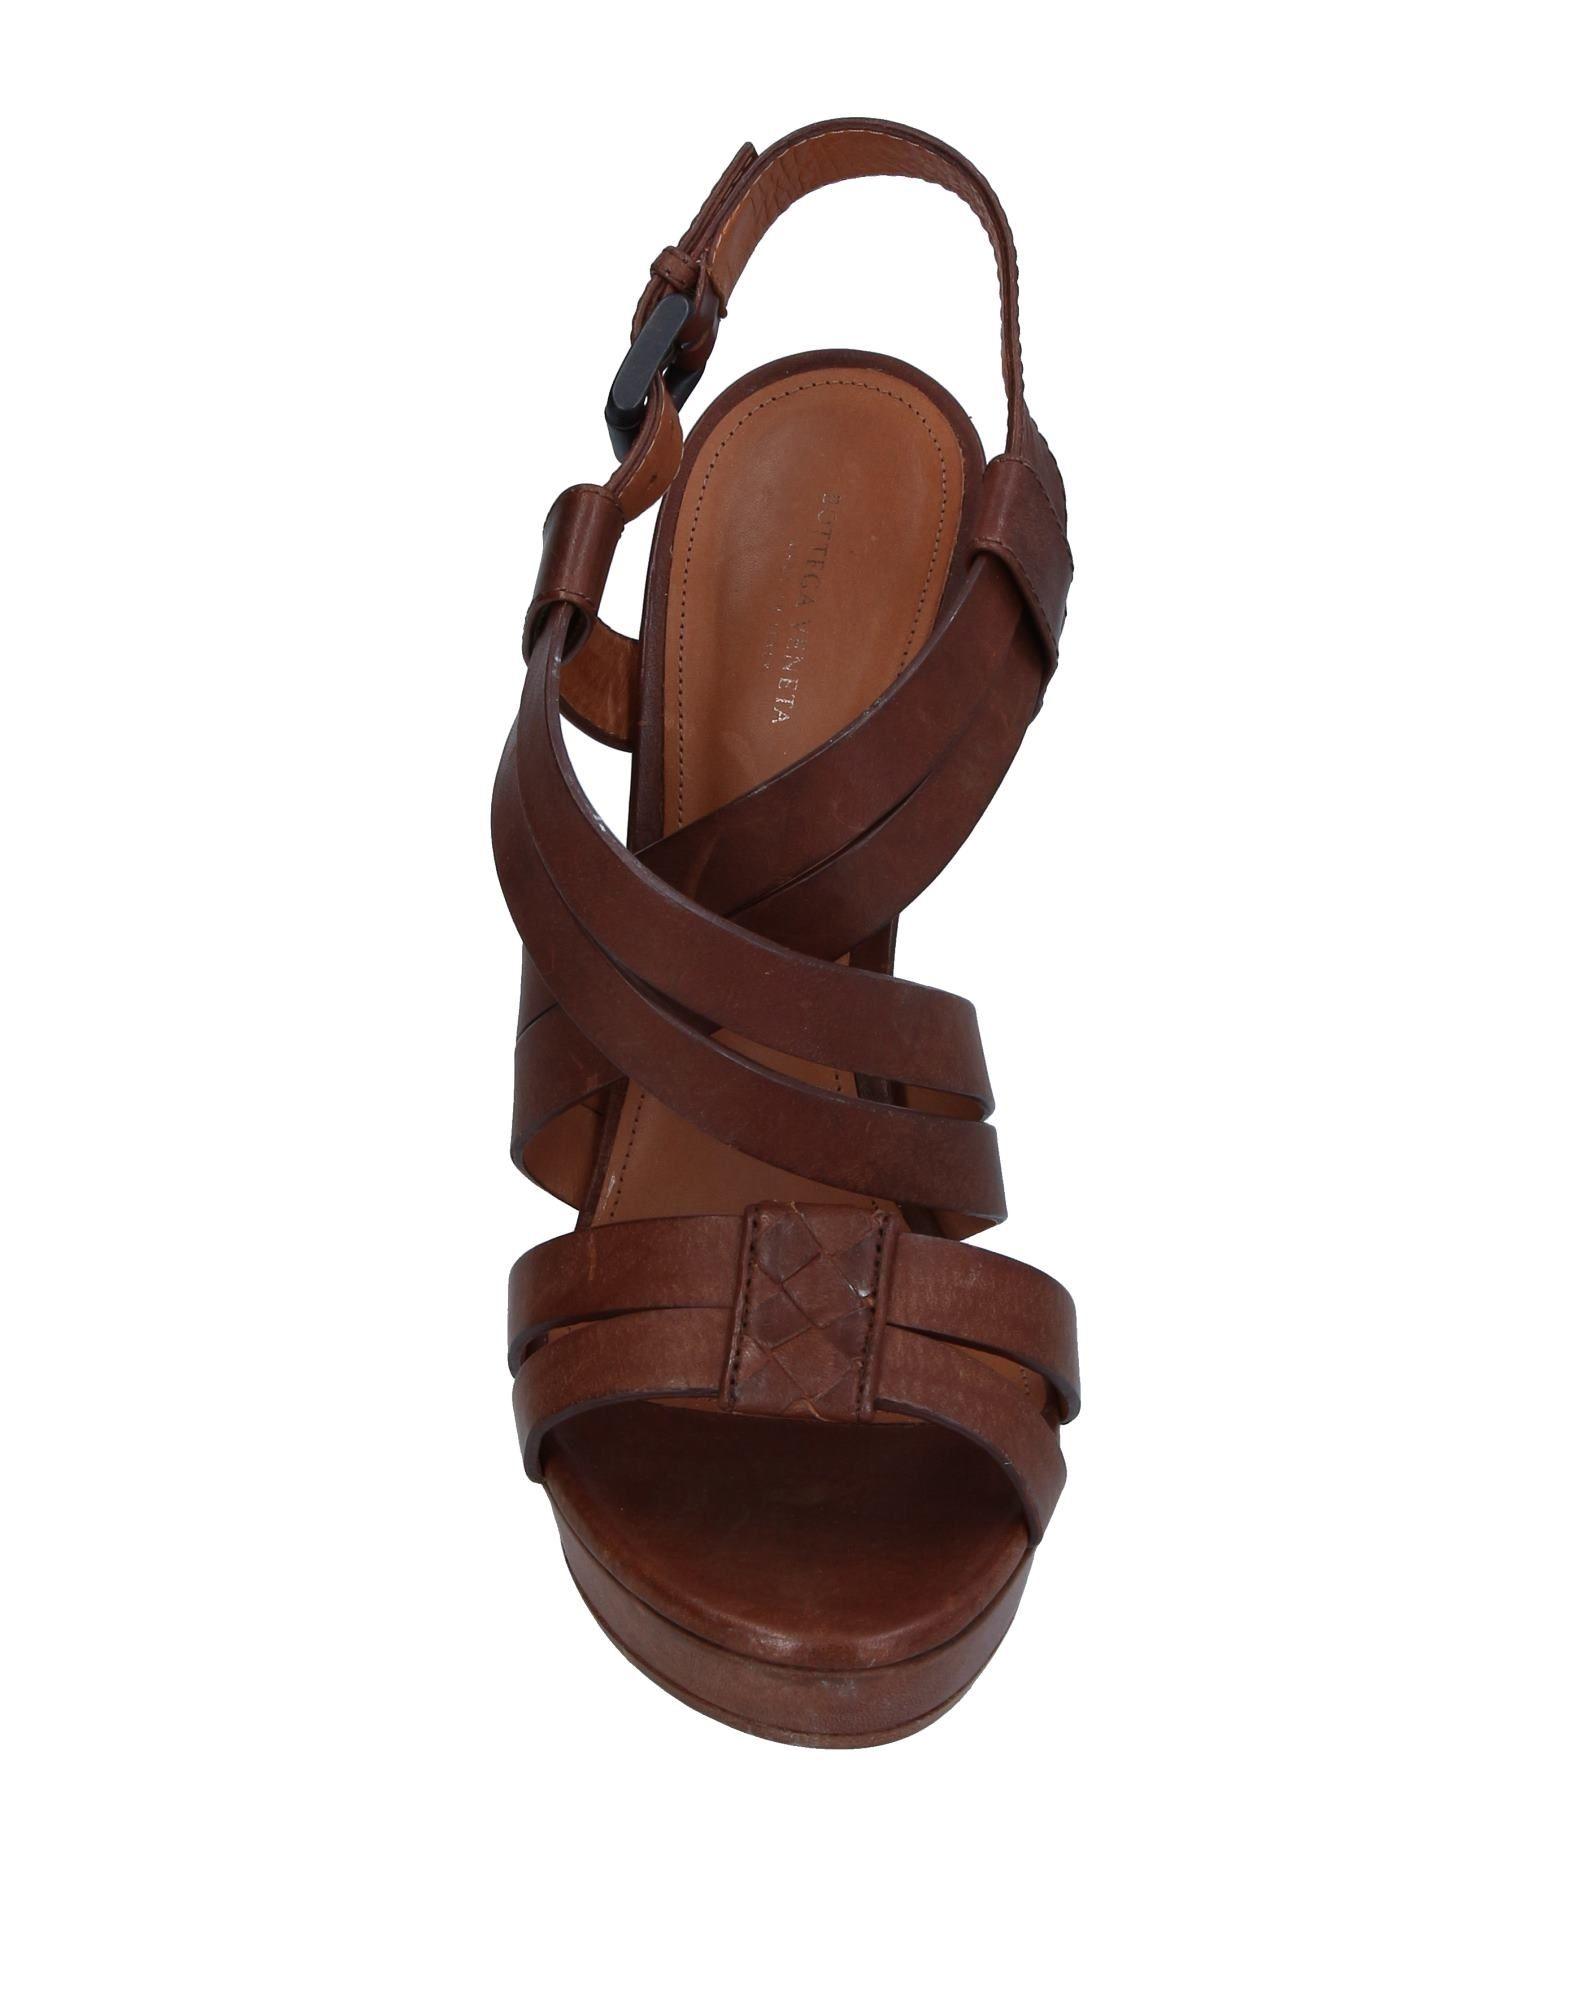 Sandales Bottega Veneta Femme - Sandales Bottega Veneta sur